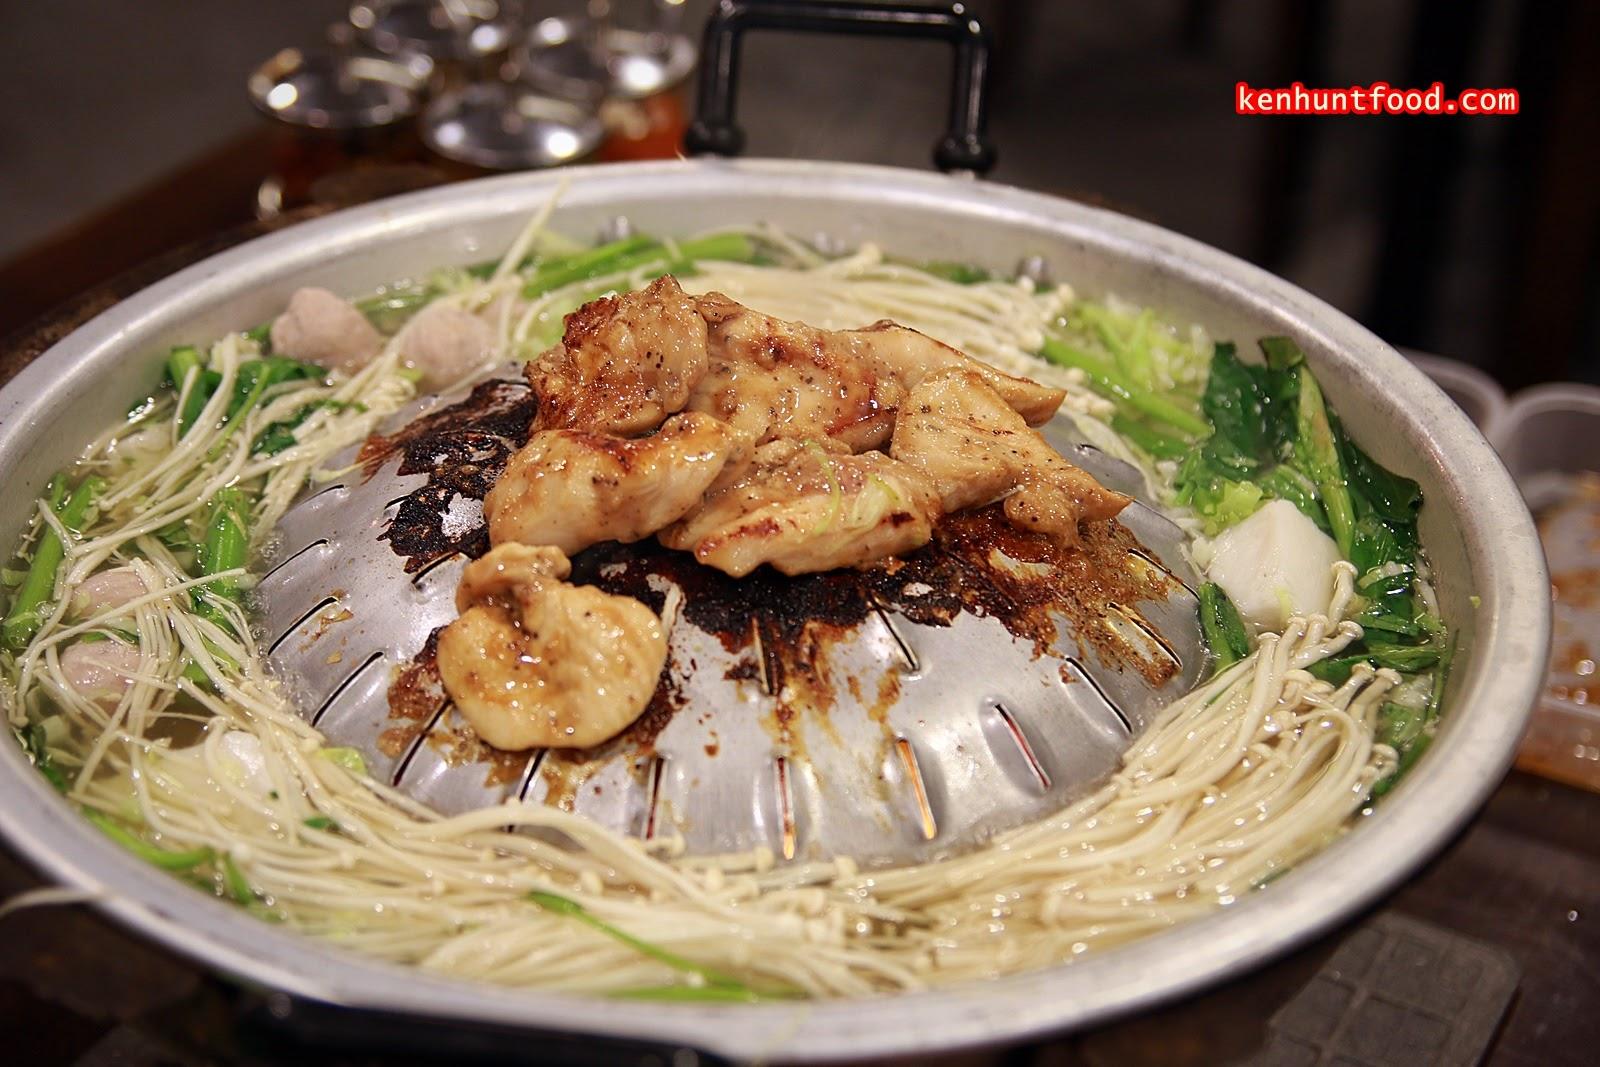 Ken Hunts Food Bangkok Garden Bbq Mookata Automall